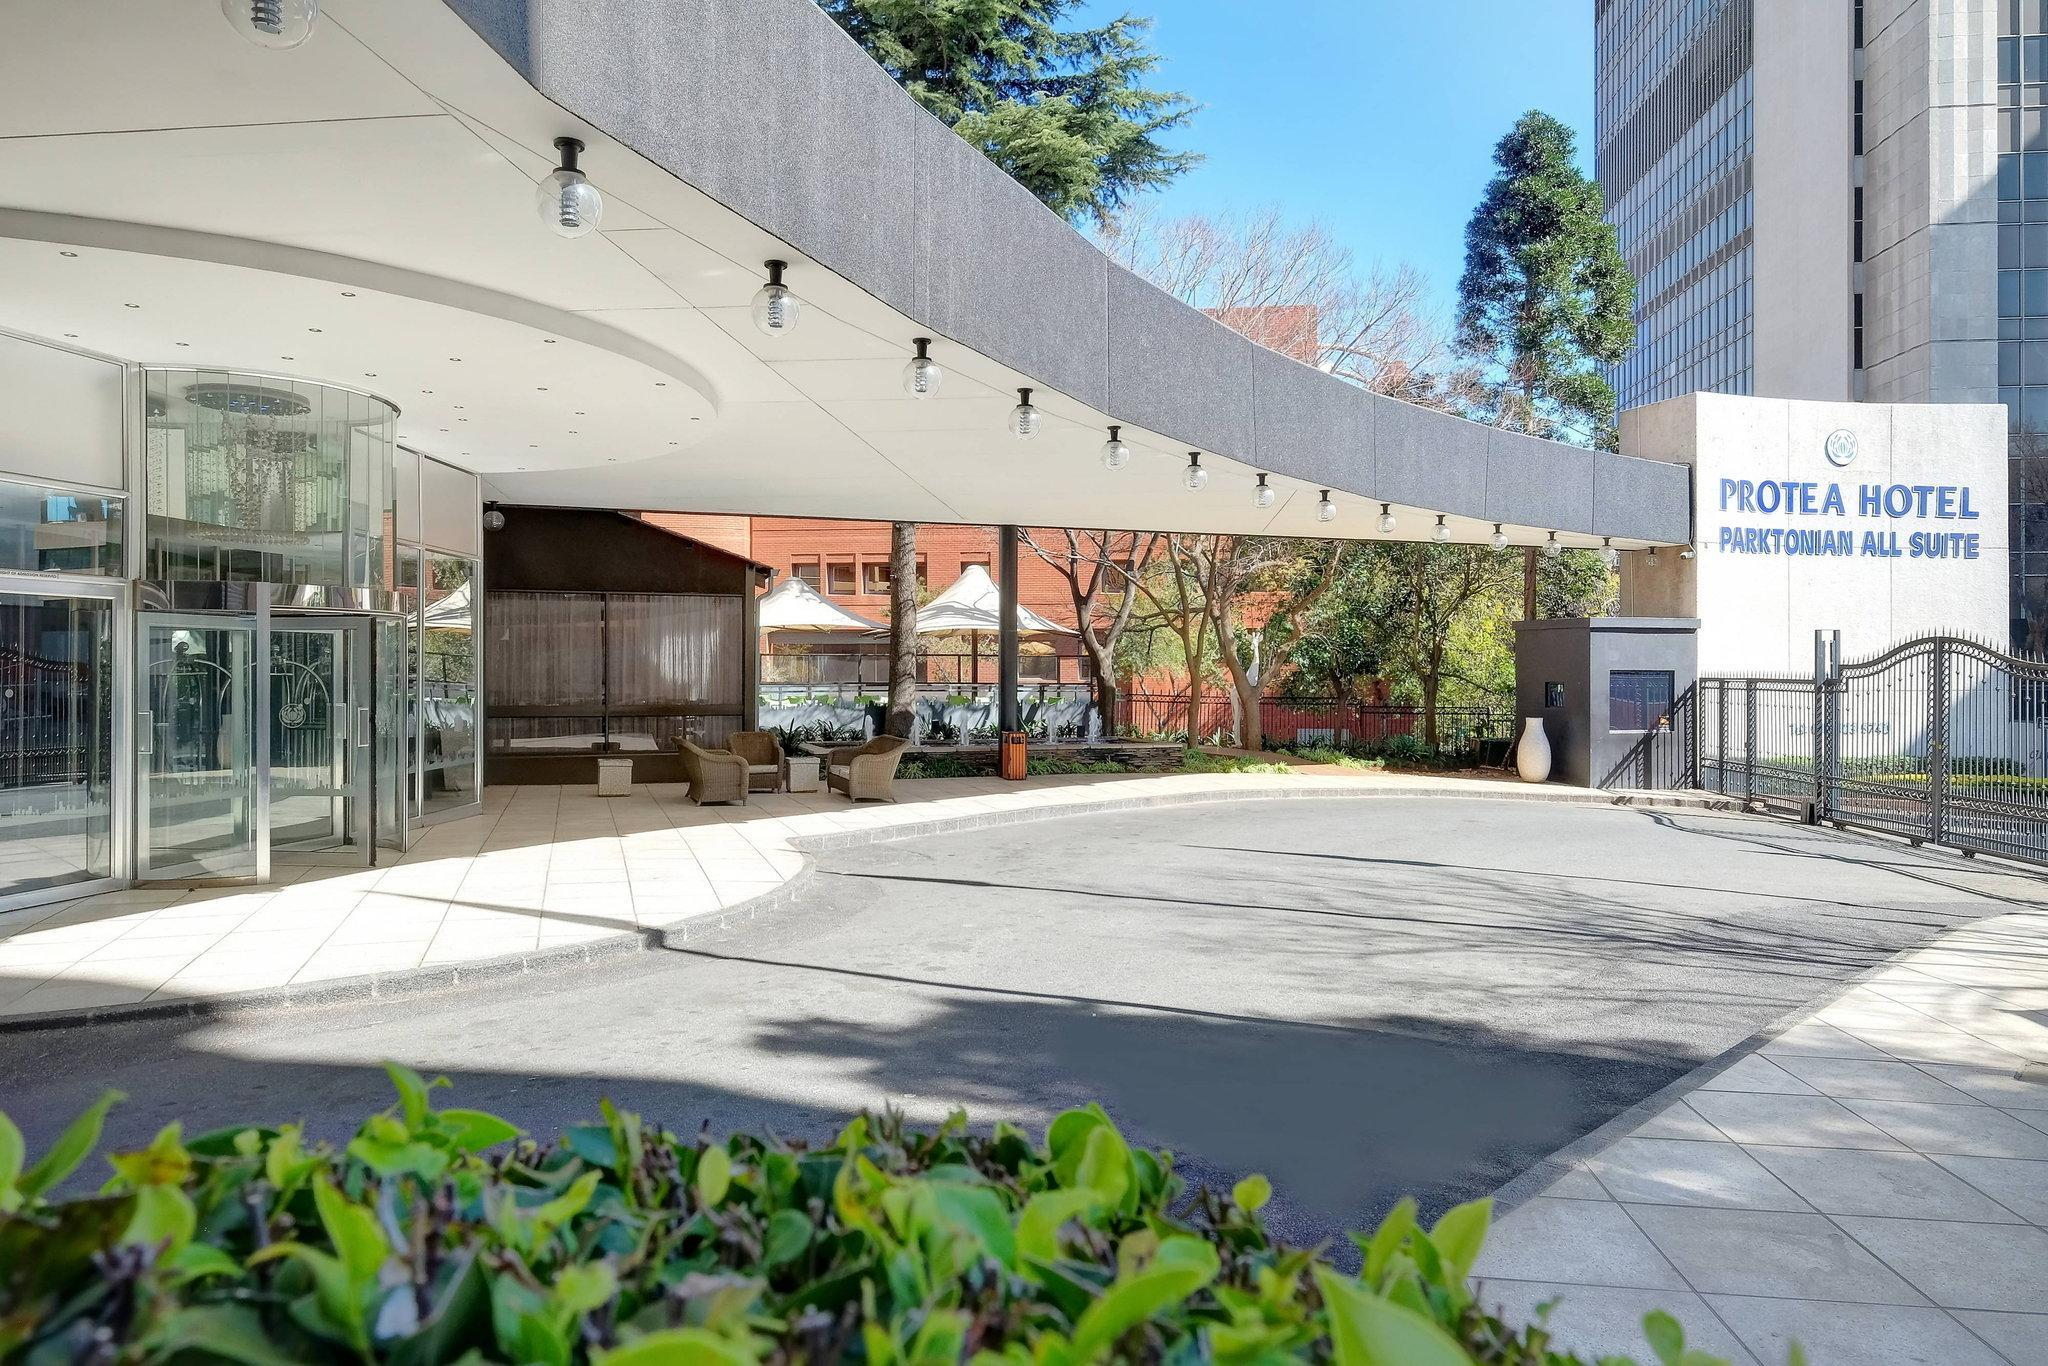 Protea Hotel Johannesburg Parktonian All Suite